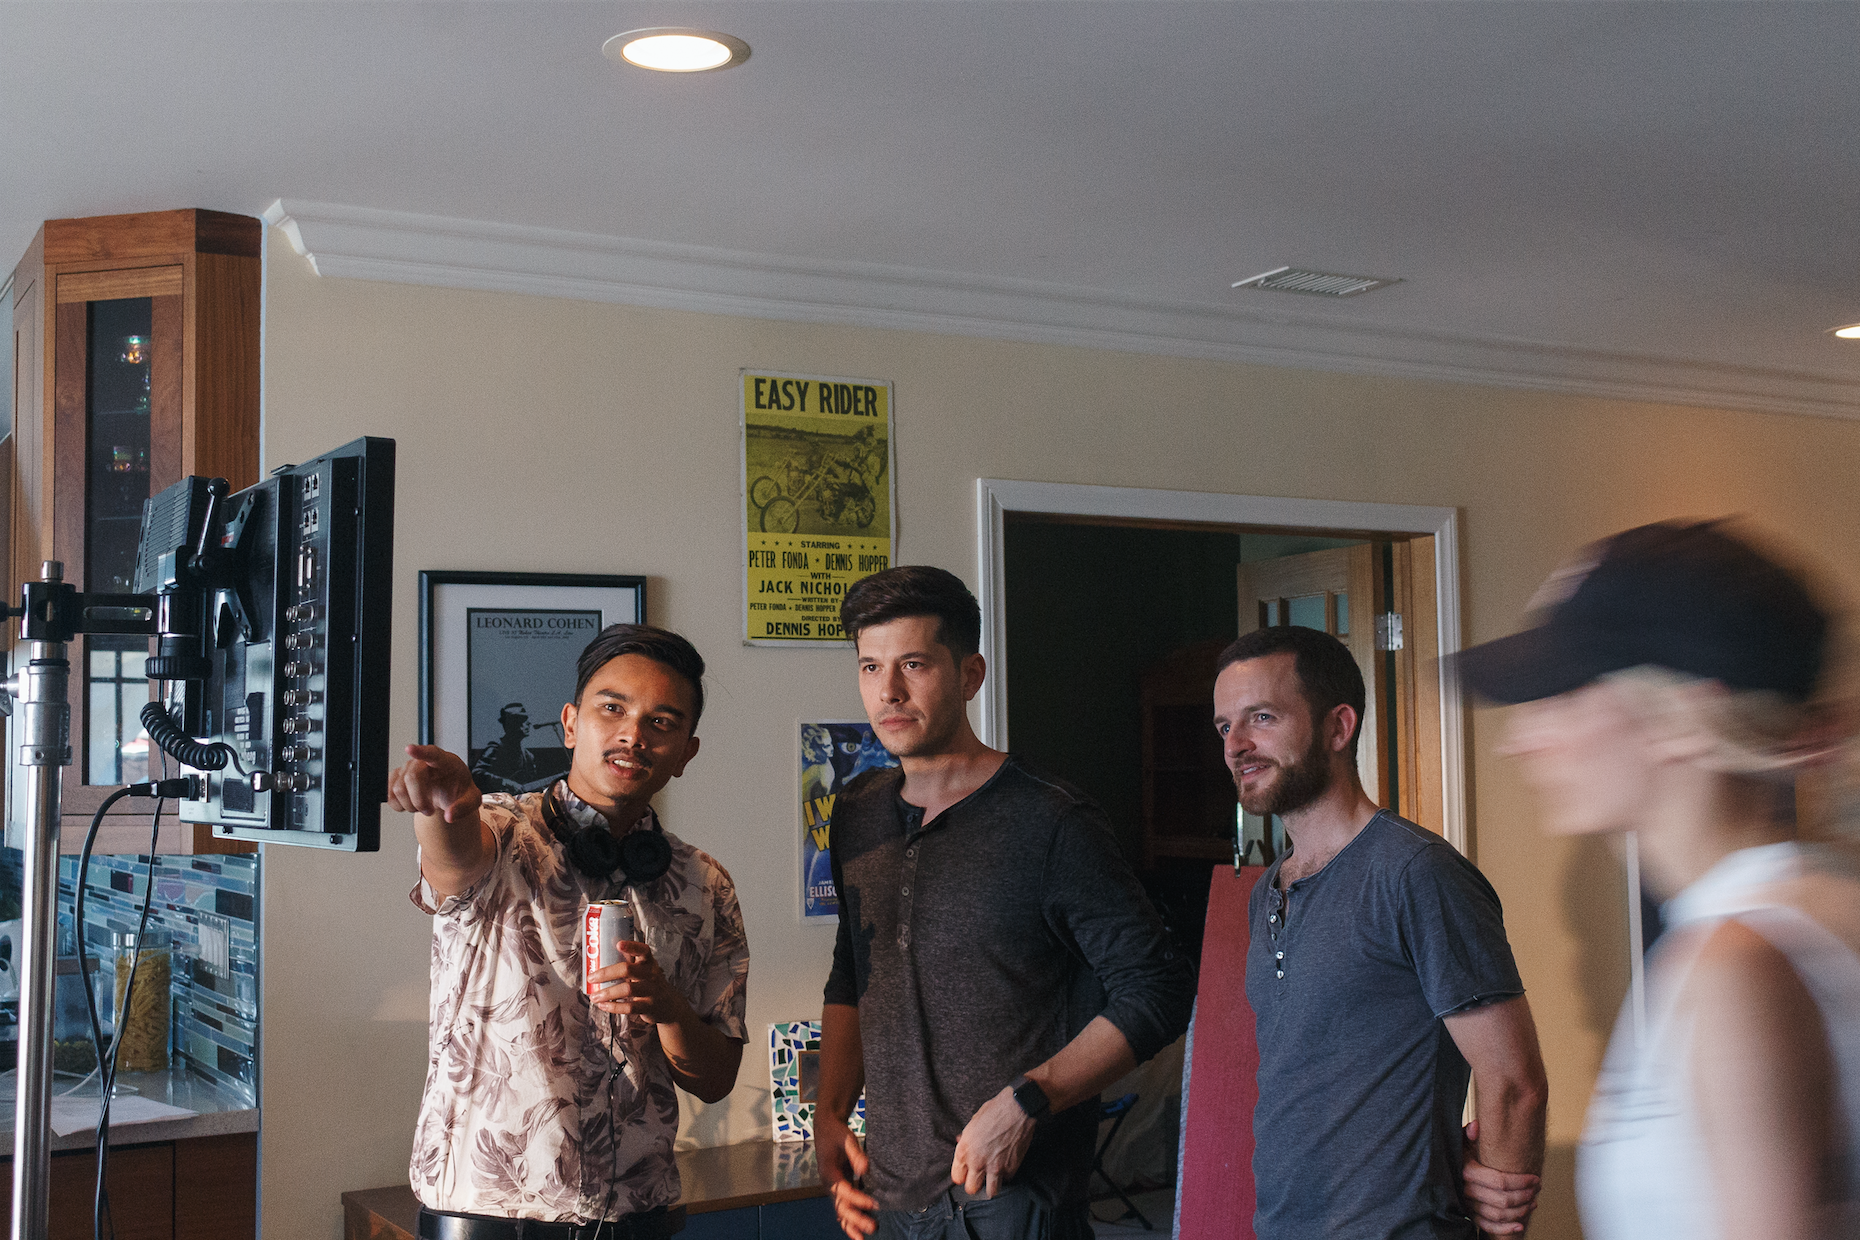 Director Ralph Torrefranca, producer Dylan Costa + AD KJ Downes